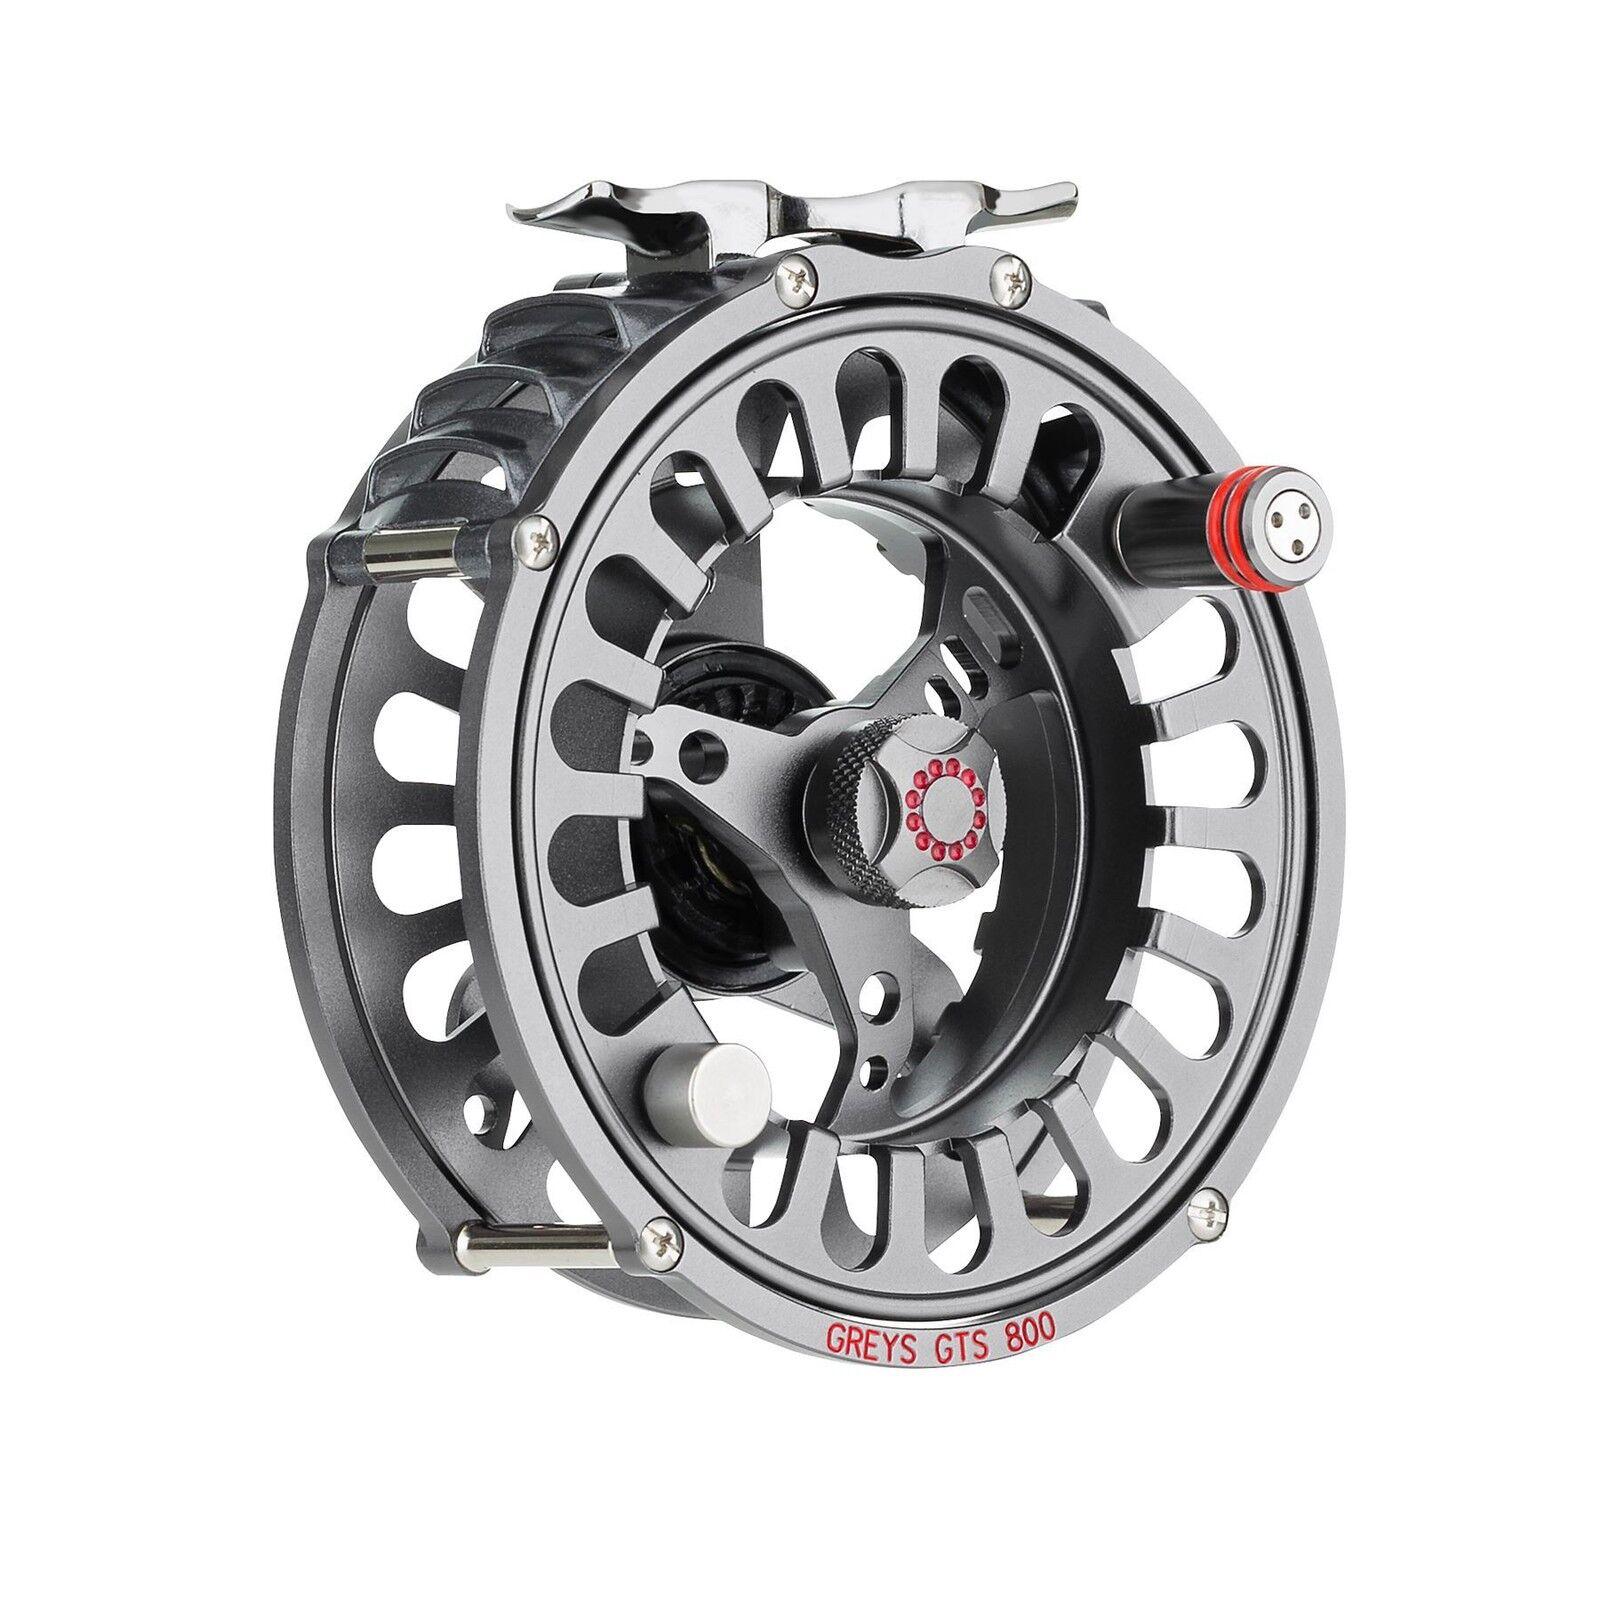 Greys GTS800  6    Fly Fishing Reel   1404536  sale online